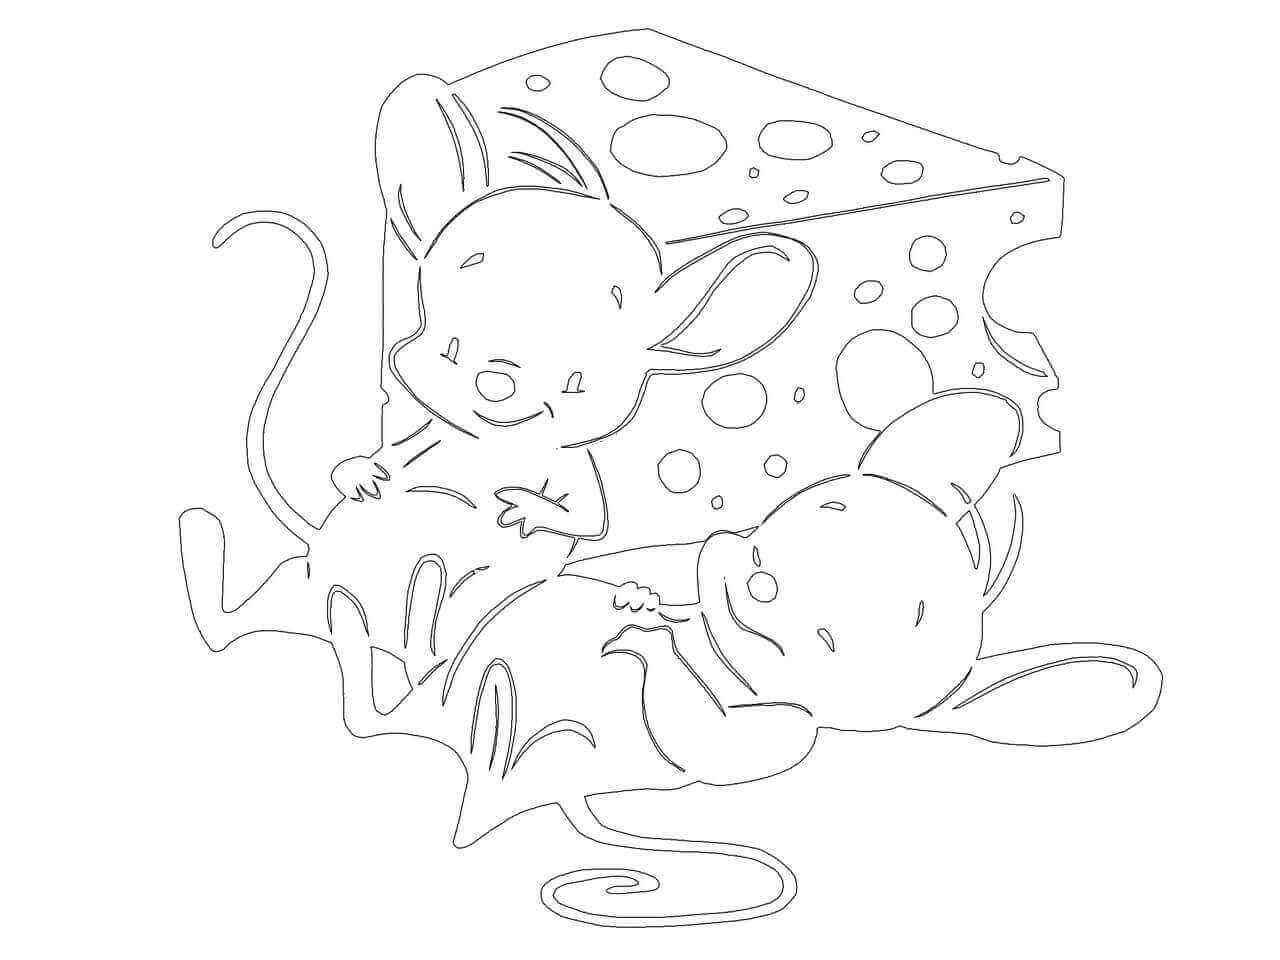 Трафареты мышей на Новый год для вырезания